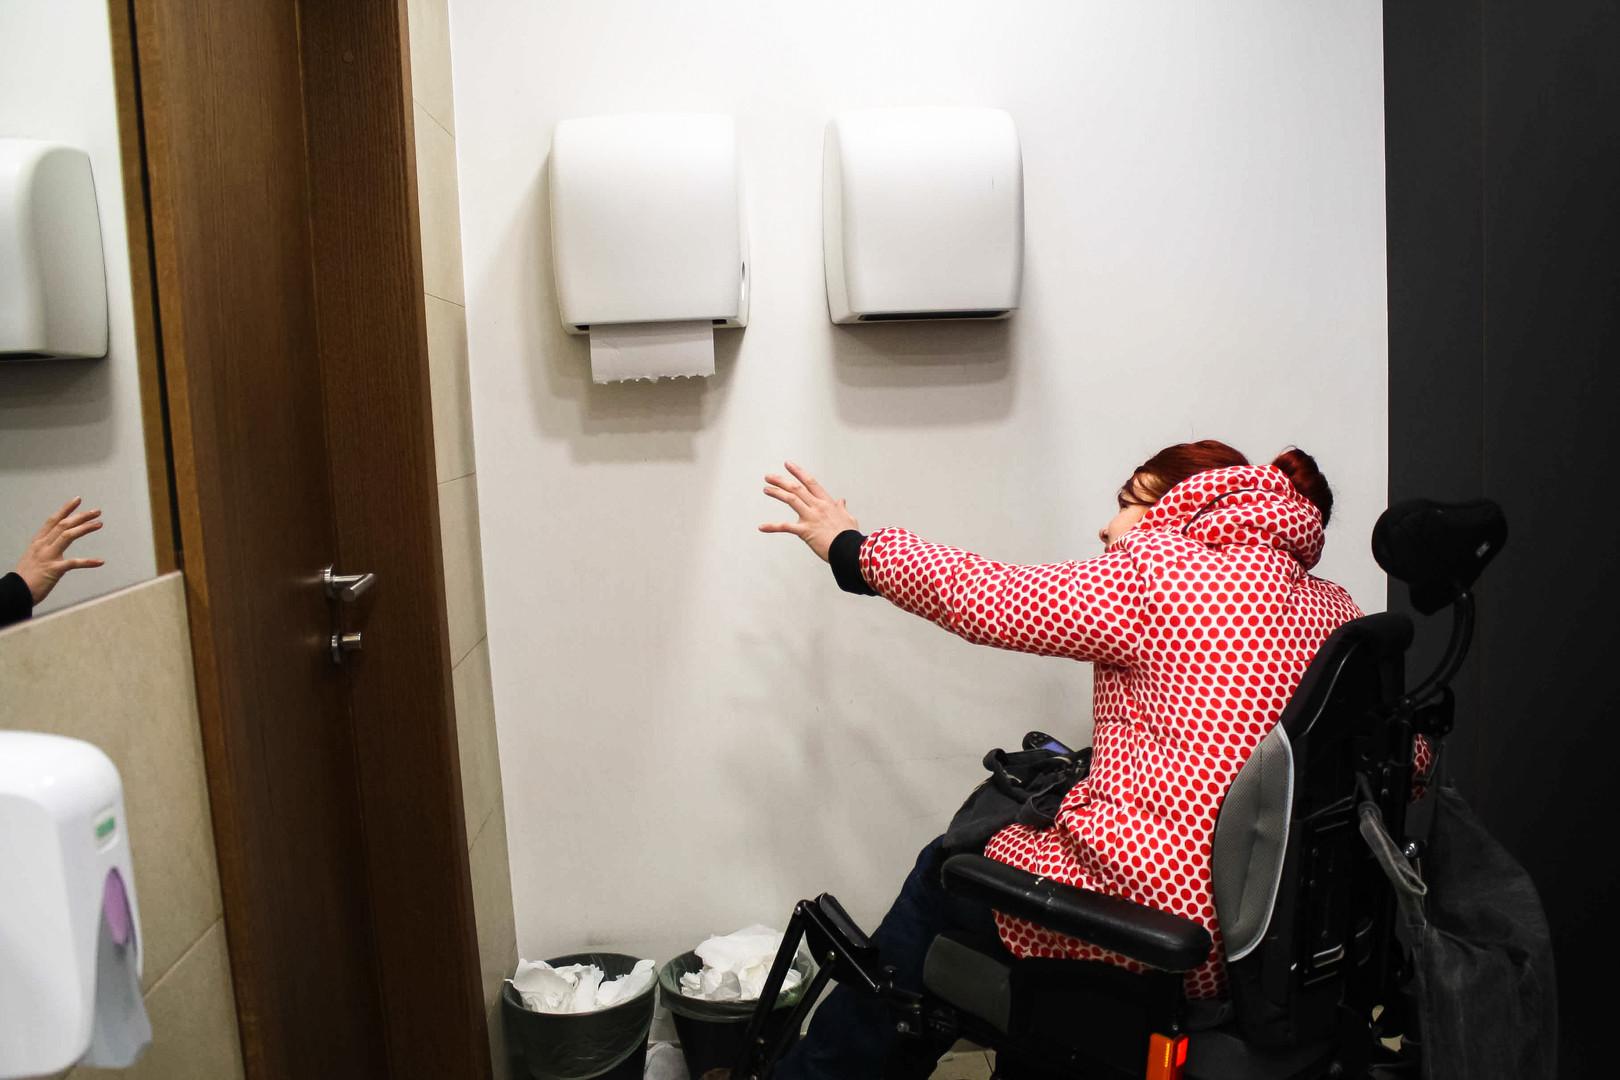 brisačka ... ne dosežem brisačke. Ampak ni panike, se obrišem v hlače ...  Towel ... I can't reach the towel. But, no problem, I'll just wipe my hands in my trousers...